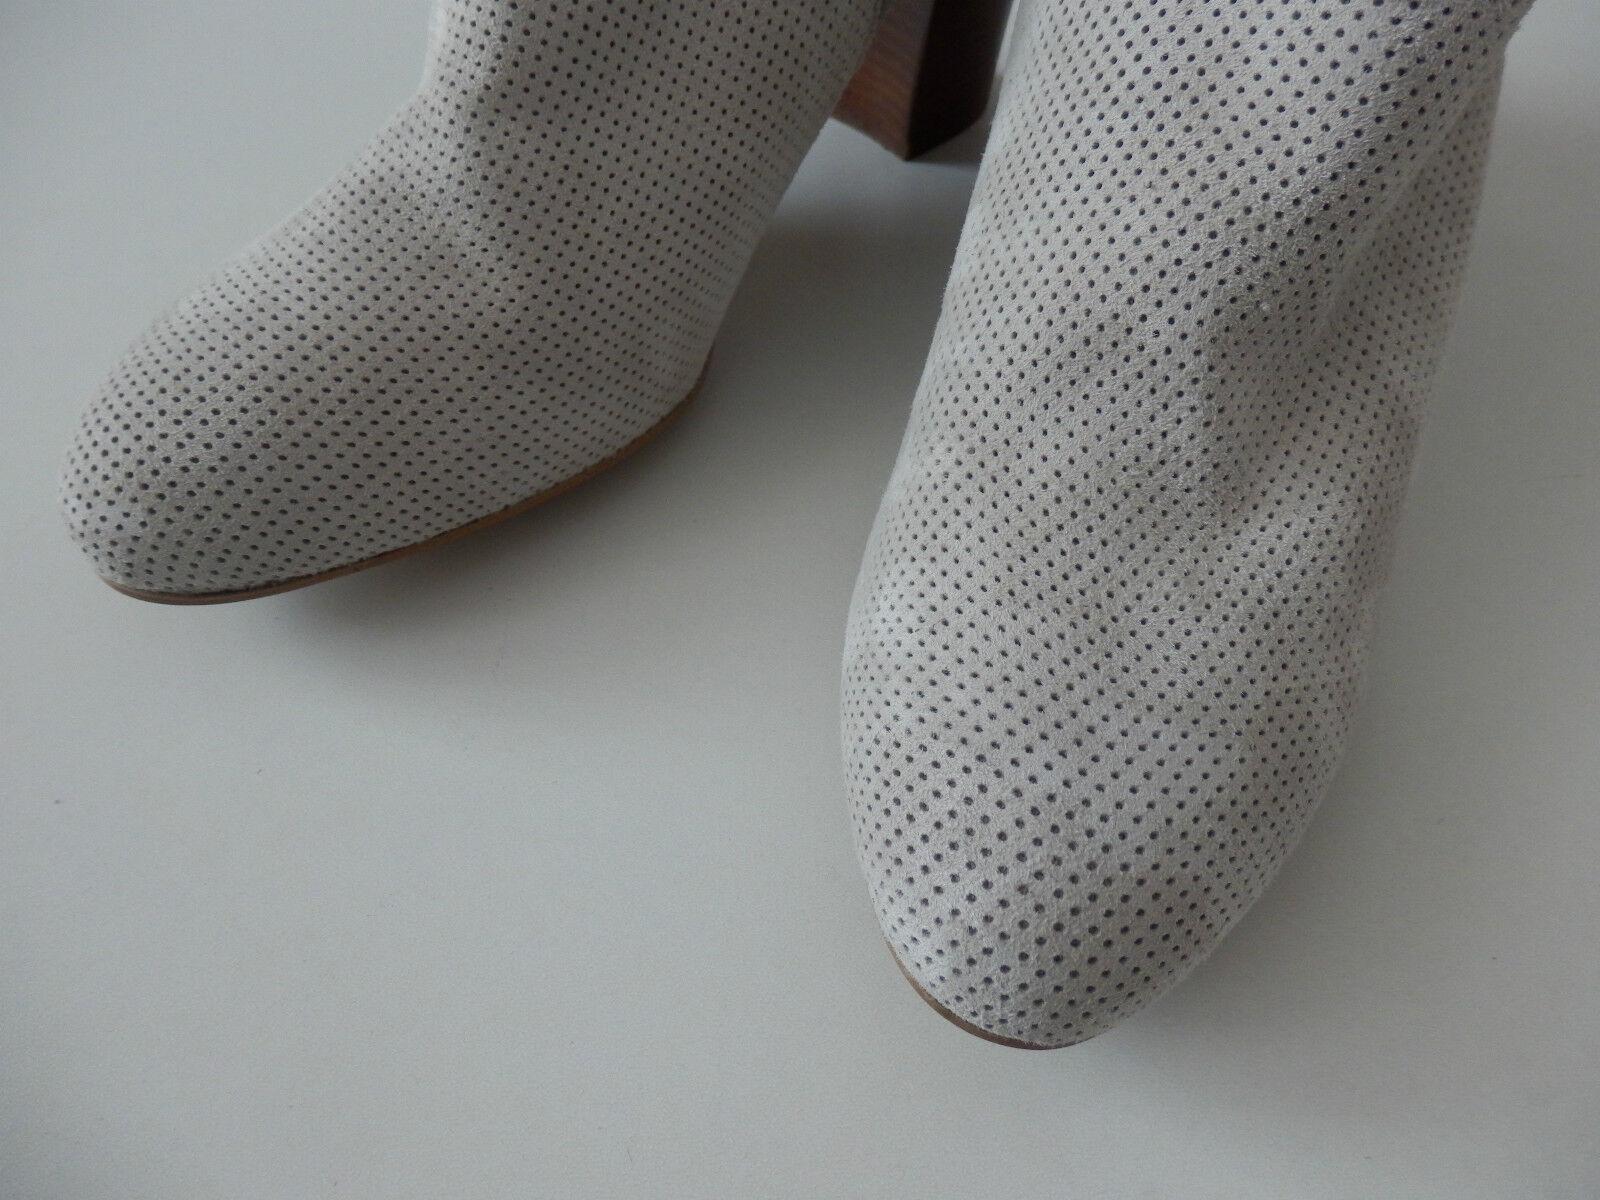 Alba Alba Alba Moda Stiefelette Leder beige Gr. 41 neu 9d2832